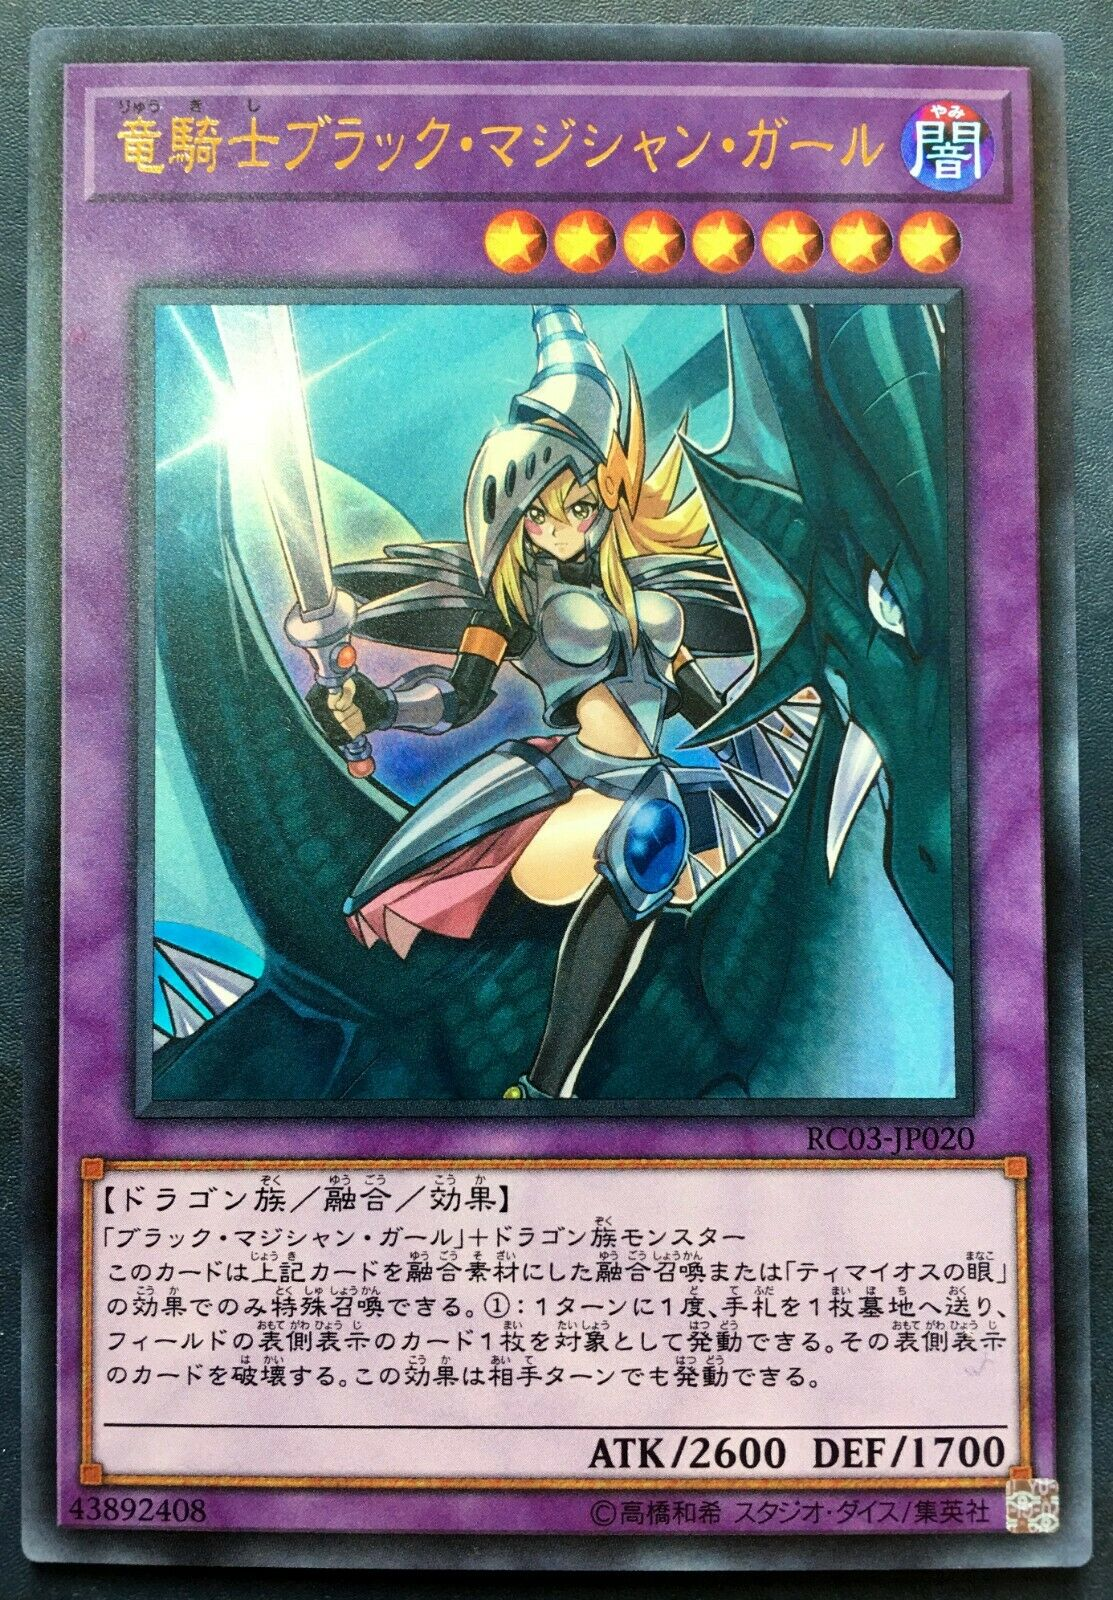 Yu-Gi-Oh RC03-JP020 Secret Rare Dark Magician Girl the Dragon Knight alternate